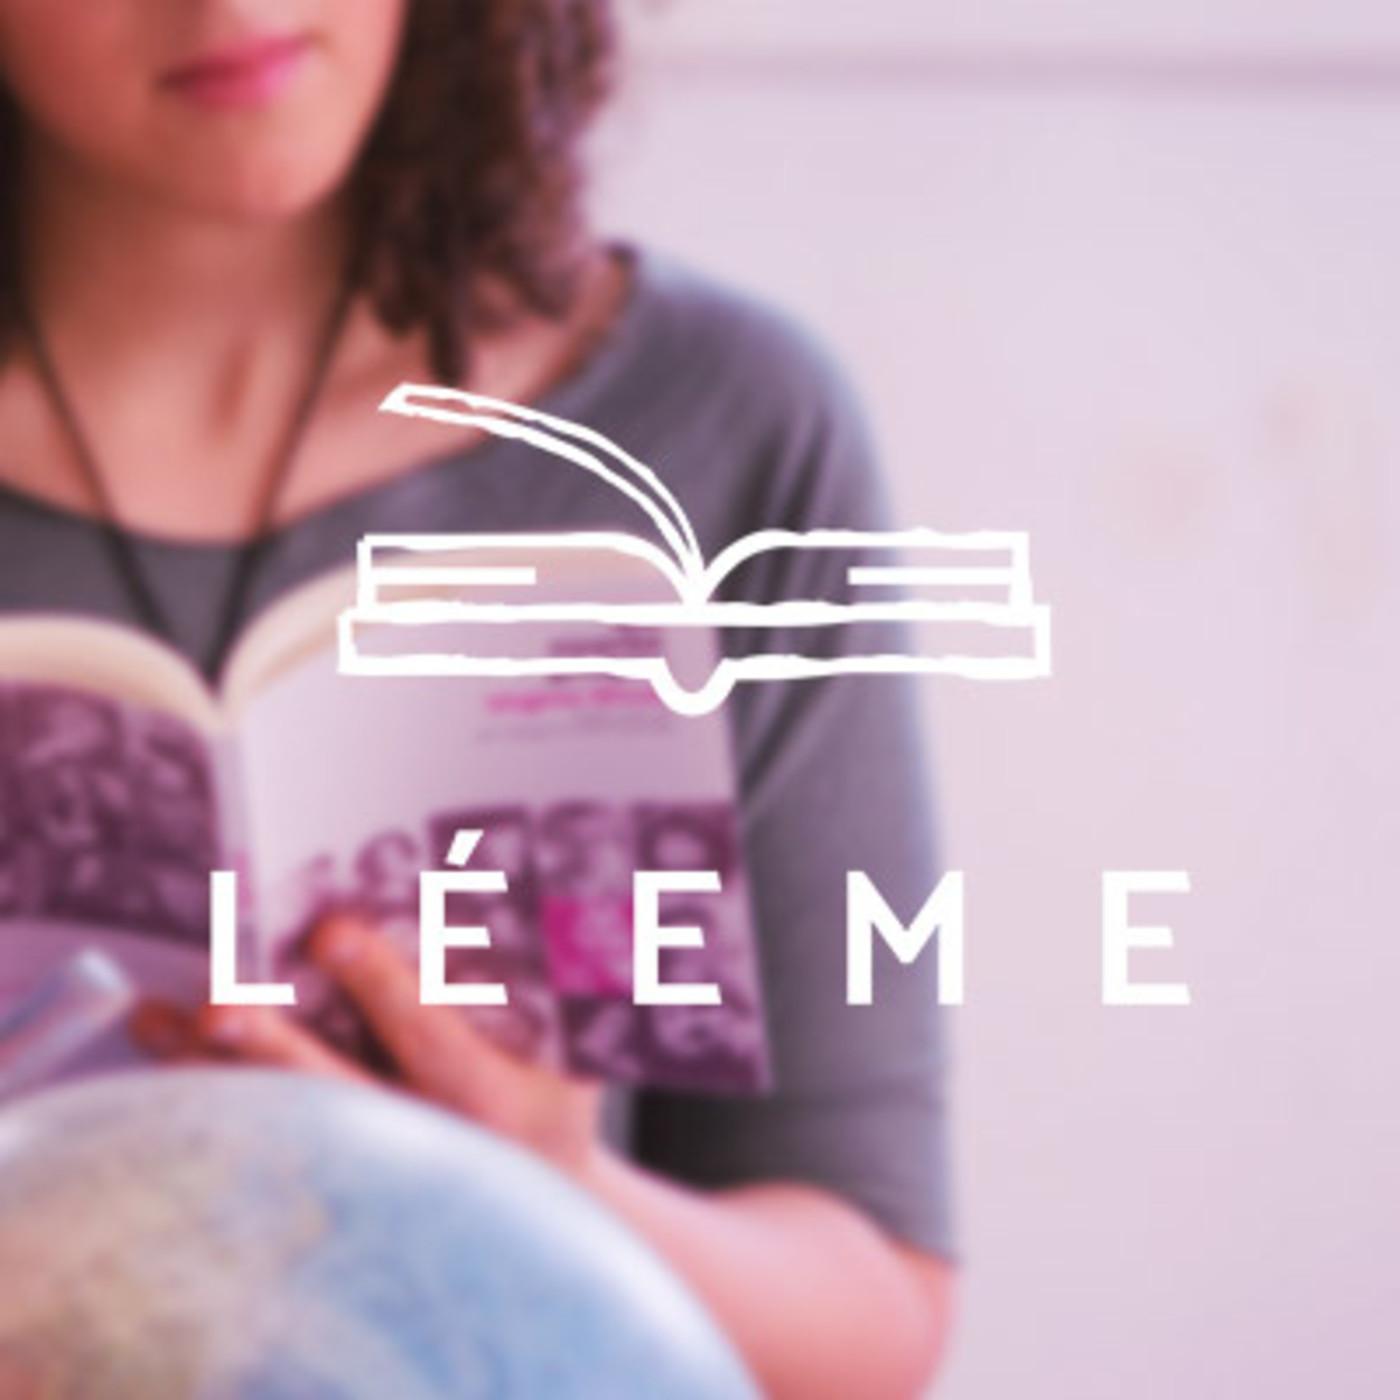 La historia de Léeme